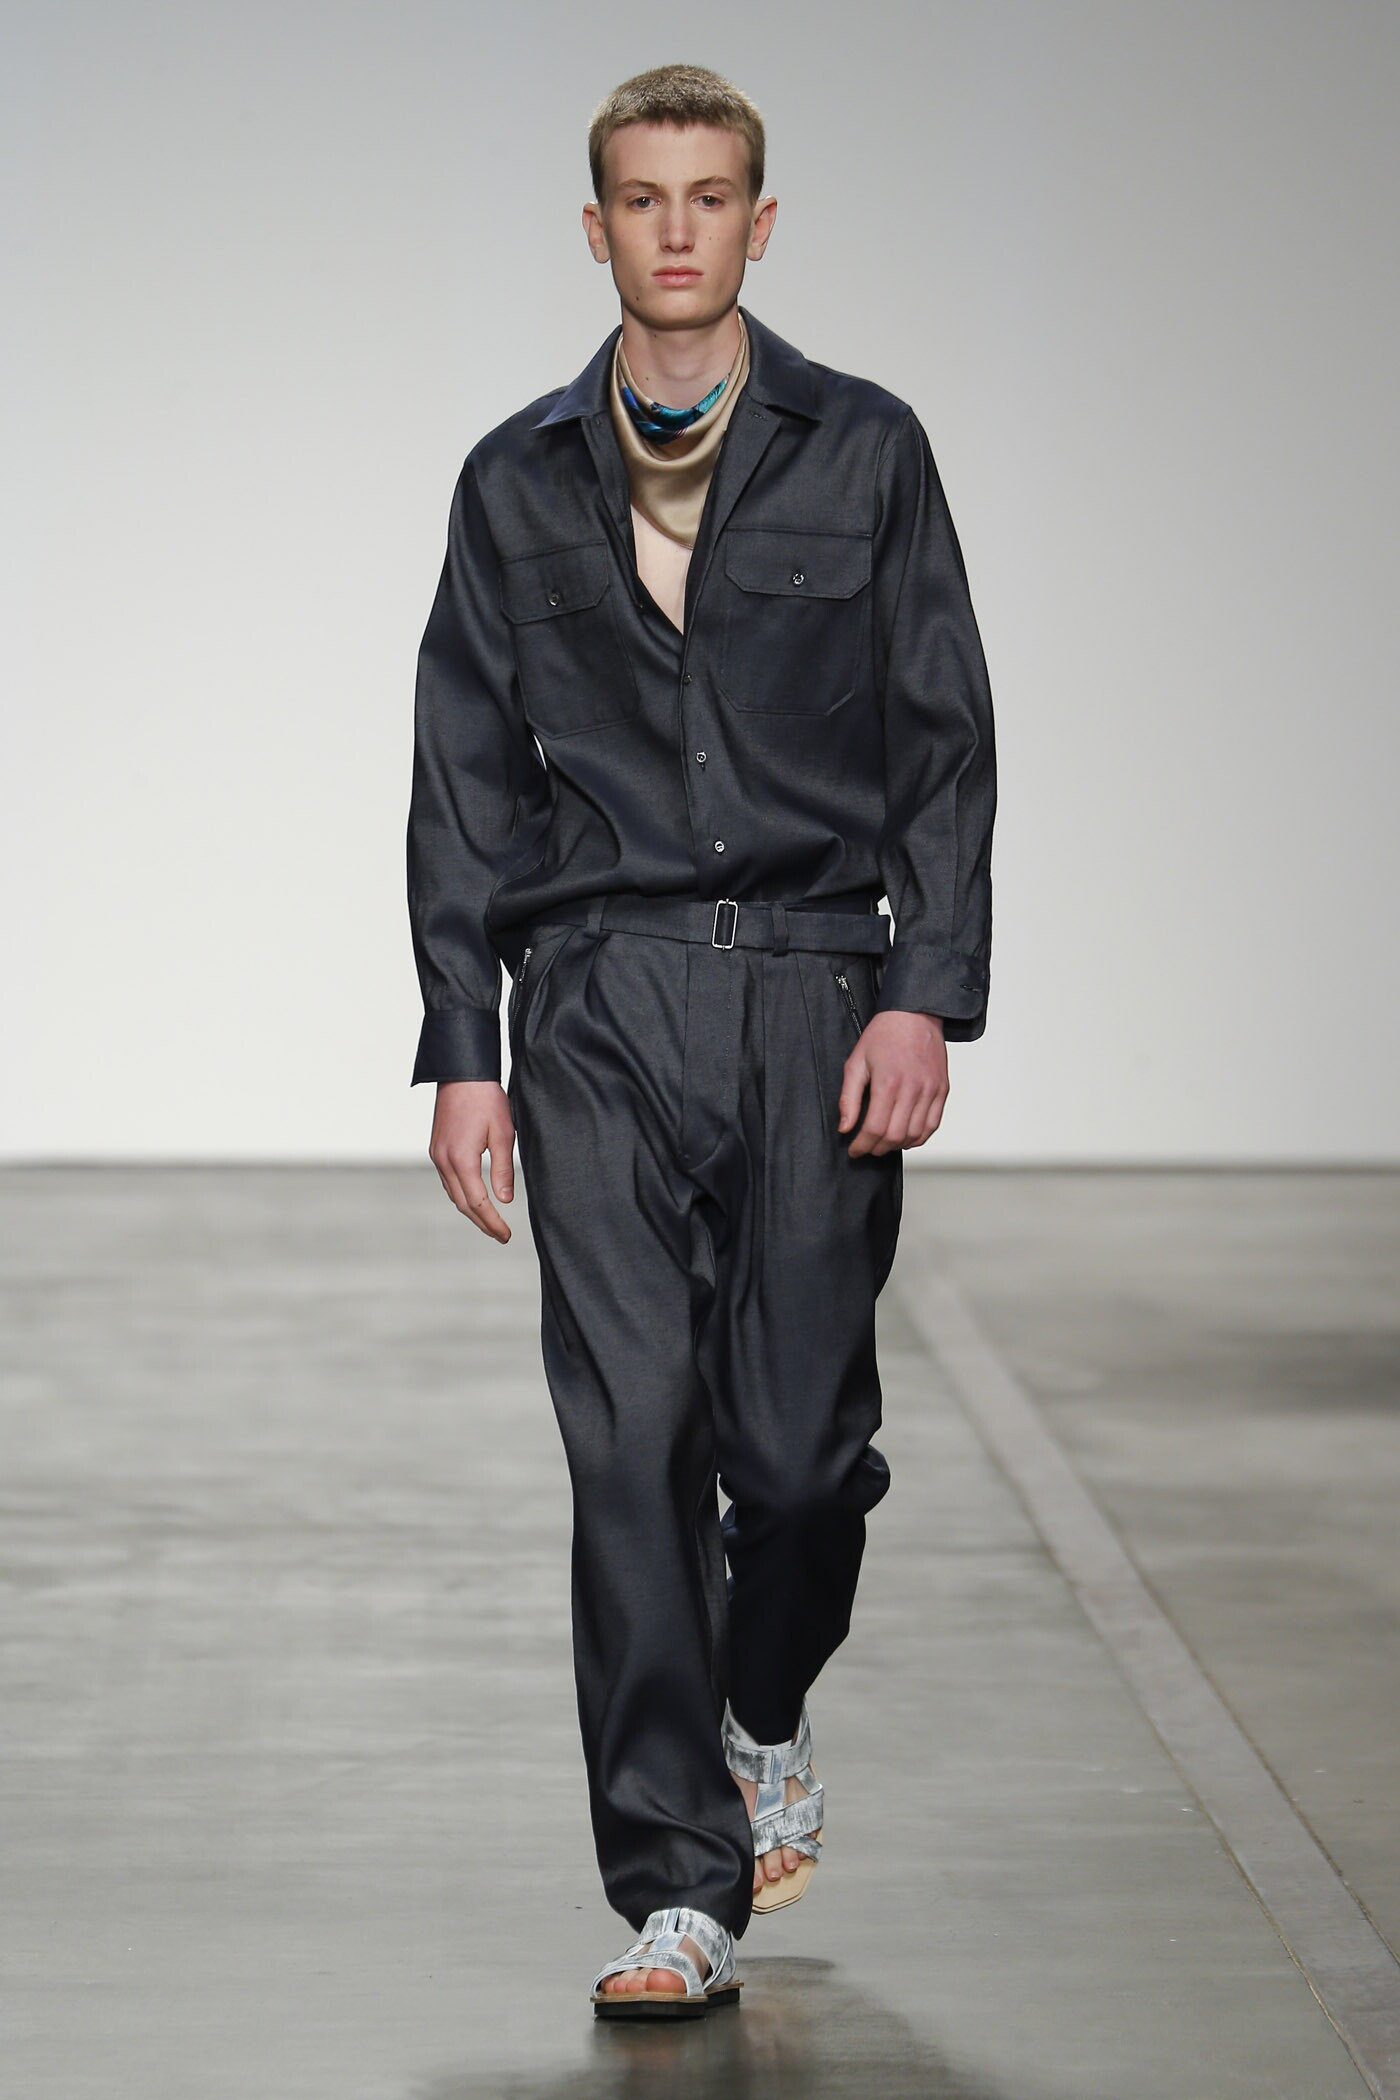 2015 Catwalk Iceberg Man Fashion Show Summer